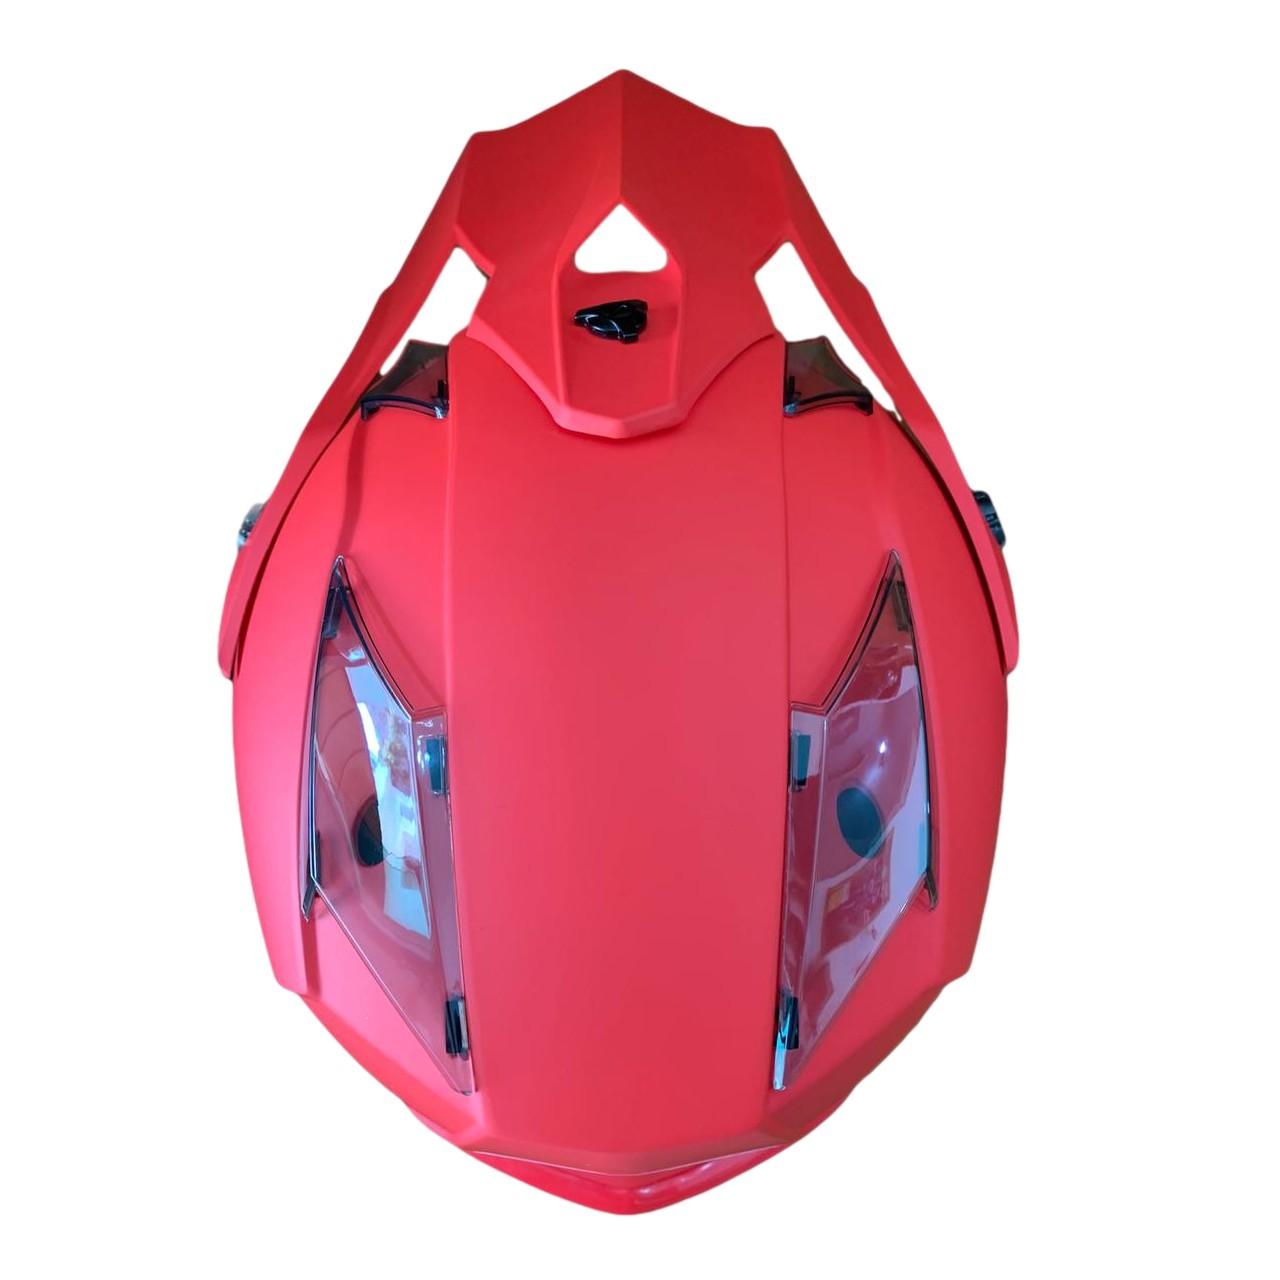 Capacete ASW Fusion Solid - Vermelho